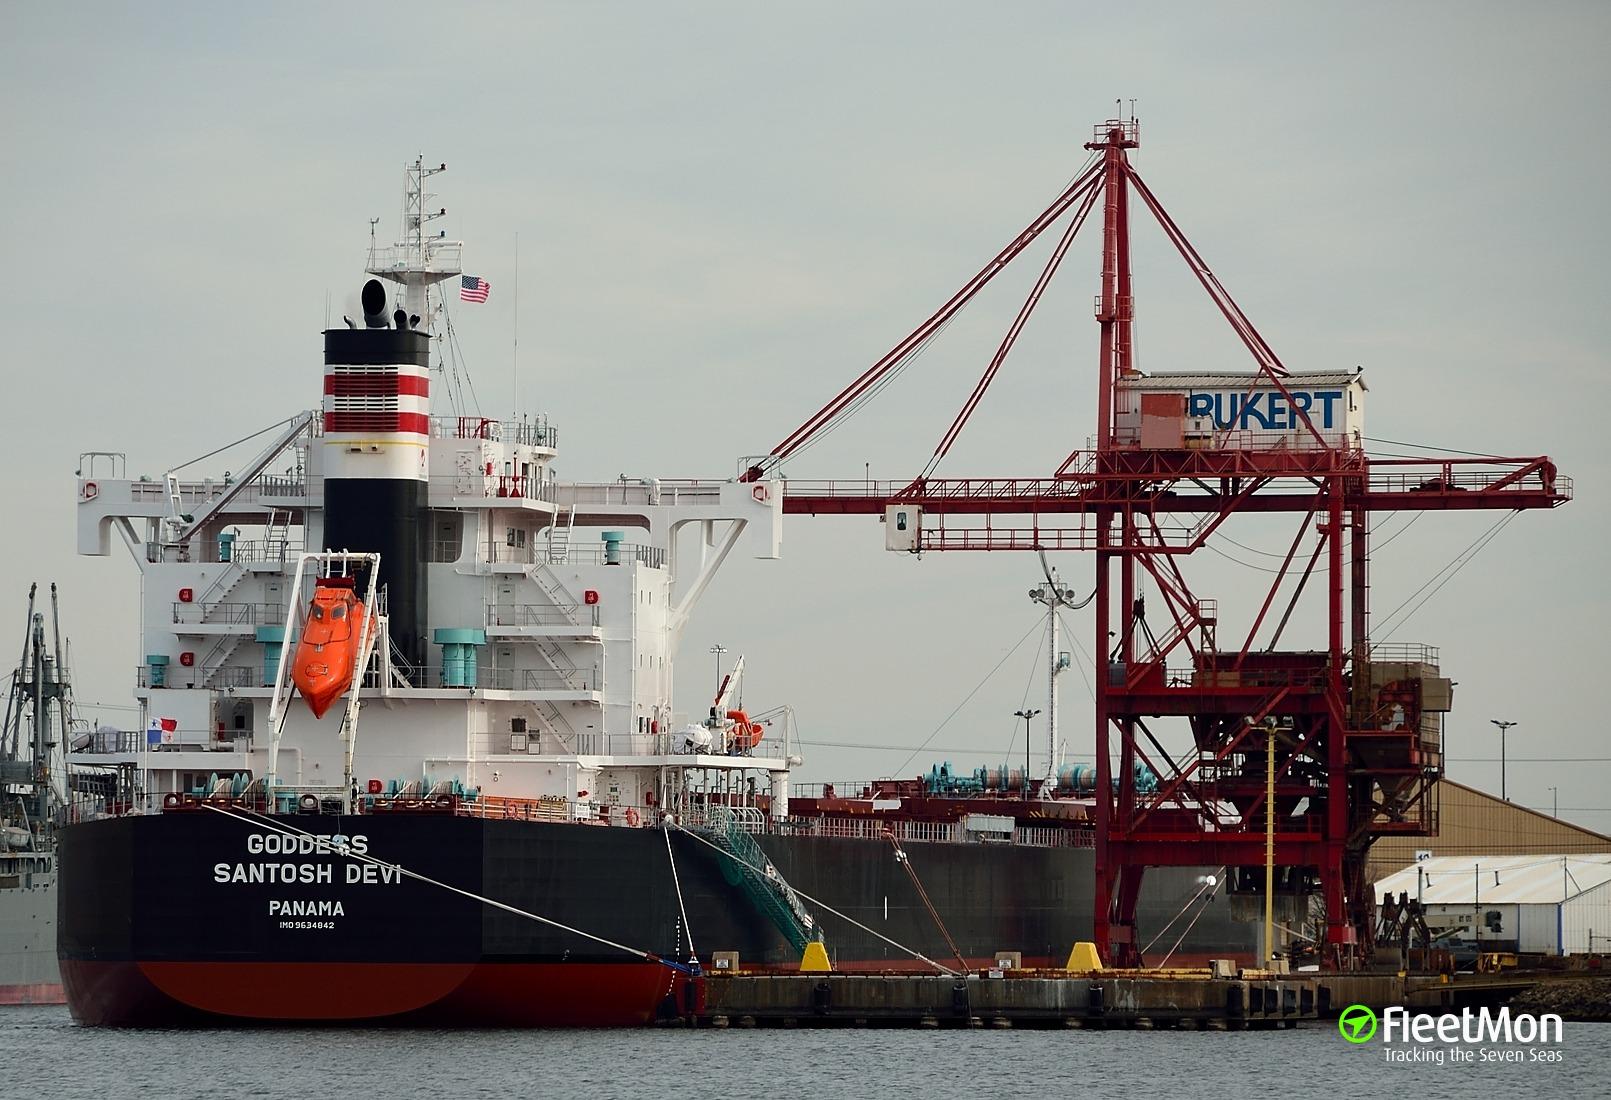 Bulk carrier GODDESS SANTOSH DEVI aground, Chile: UPDATE